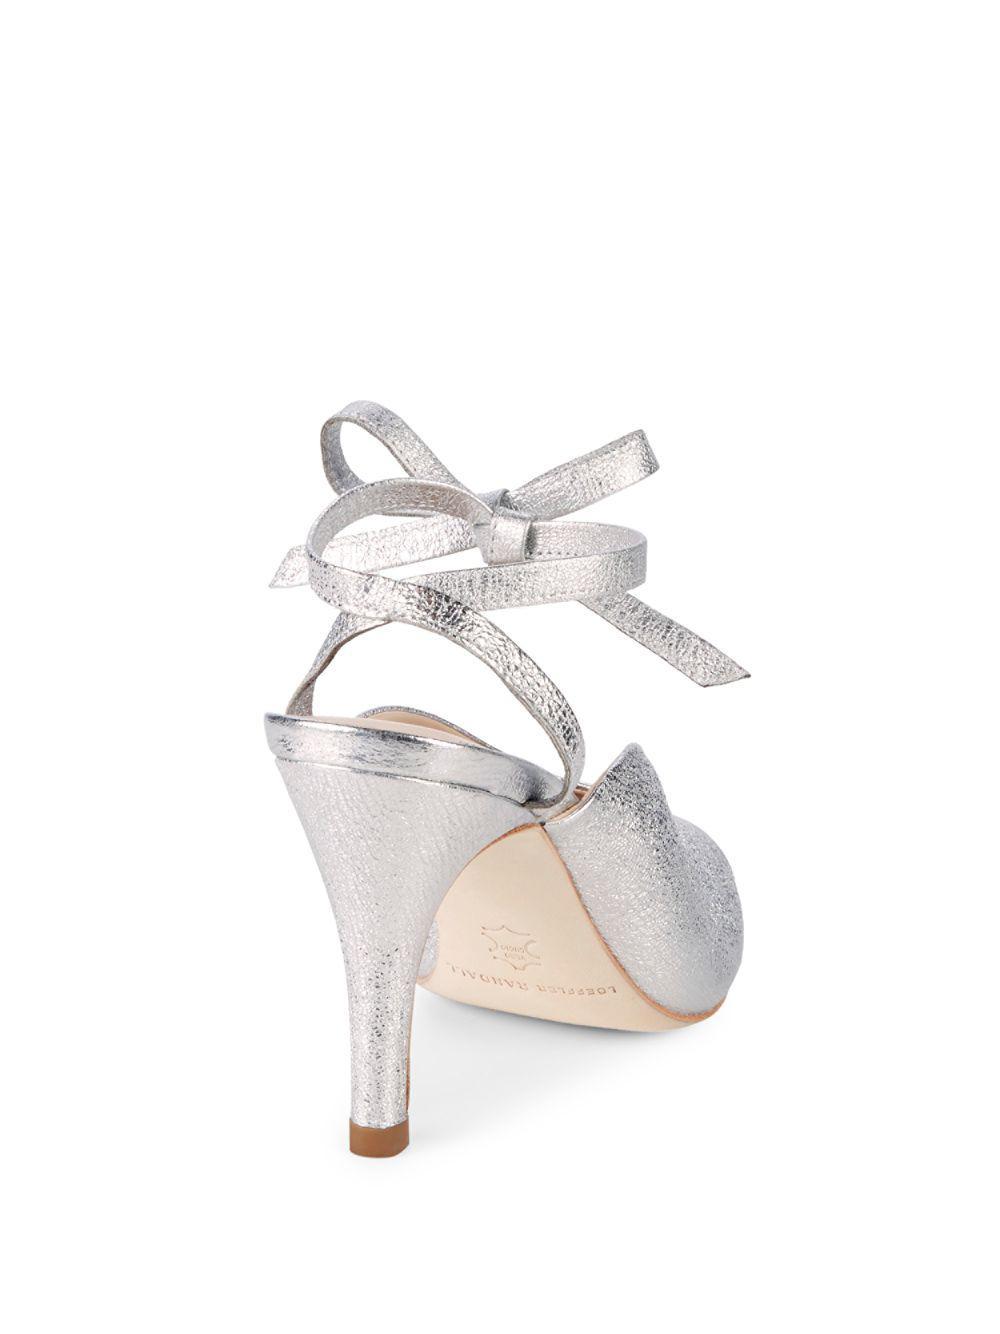 1cb58ecaa94 Loeffler Randall Mila Ankle Wrap Leather Sandals in Metallic - Lyst